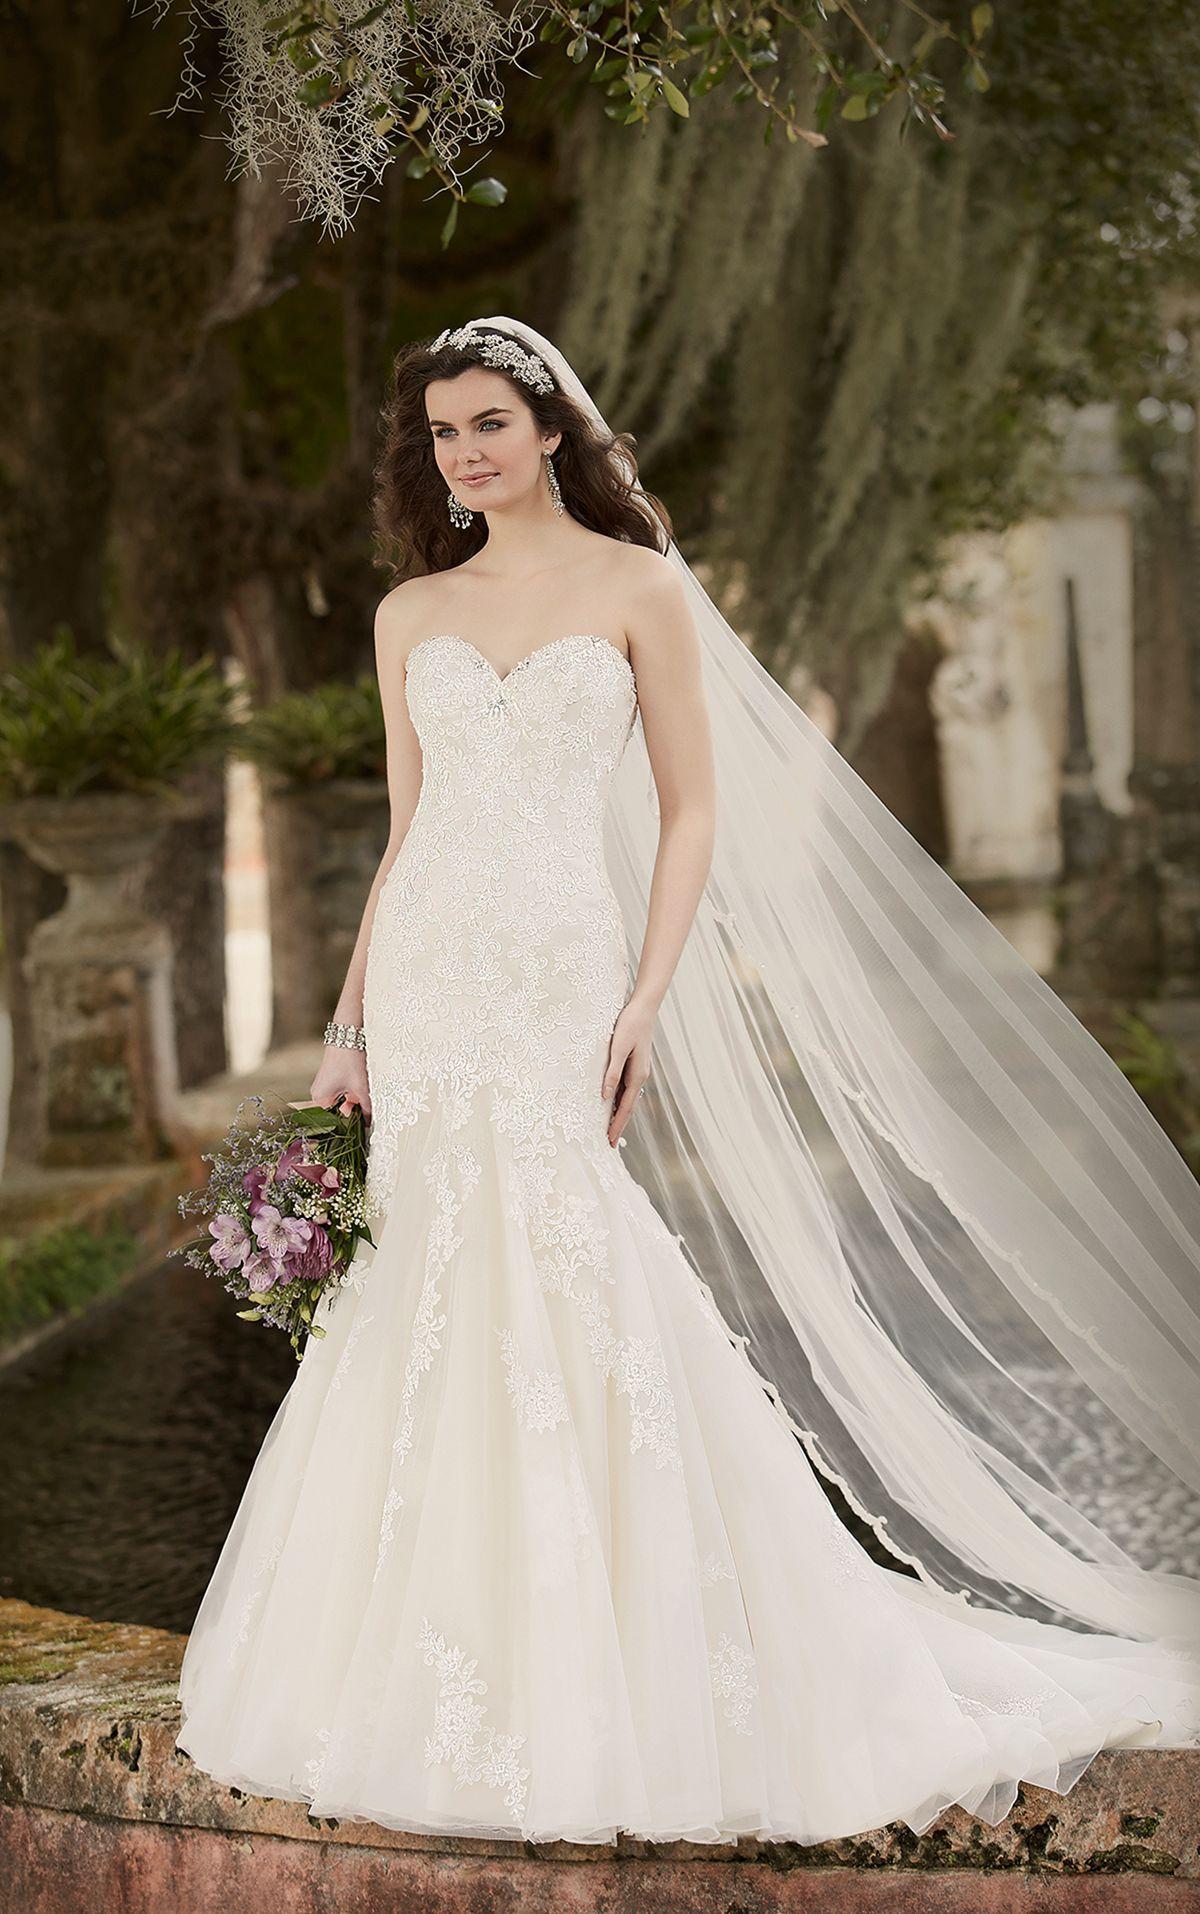 25 Beautiful Classic Wedding Dresses For Bride Look More Beautiful